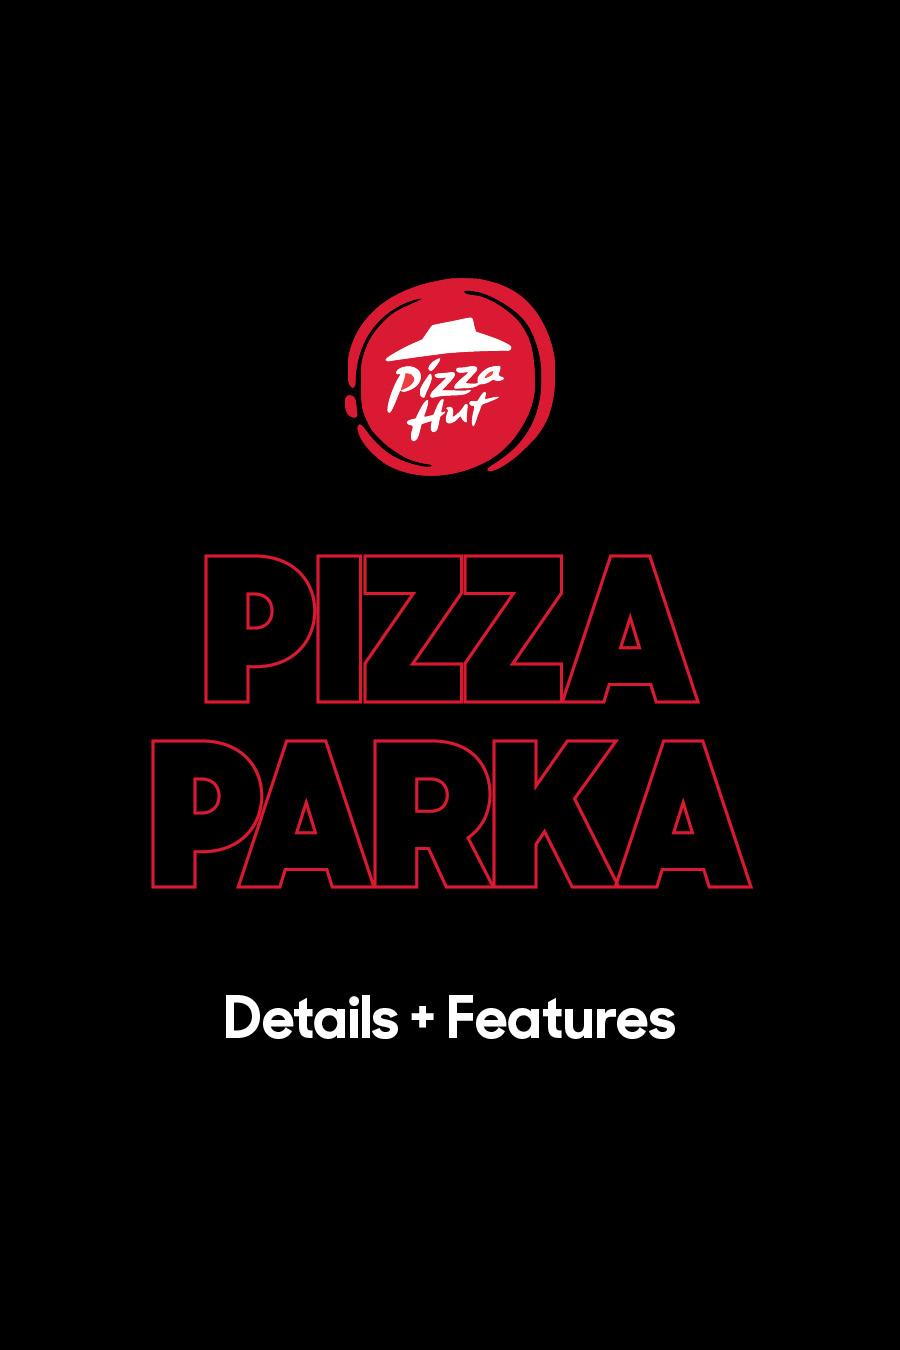 PH_PizzaParka_3x4.5_hang_tag_vF.jpg